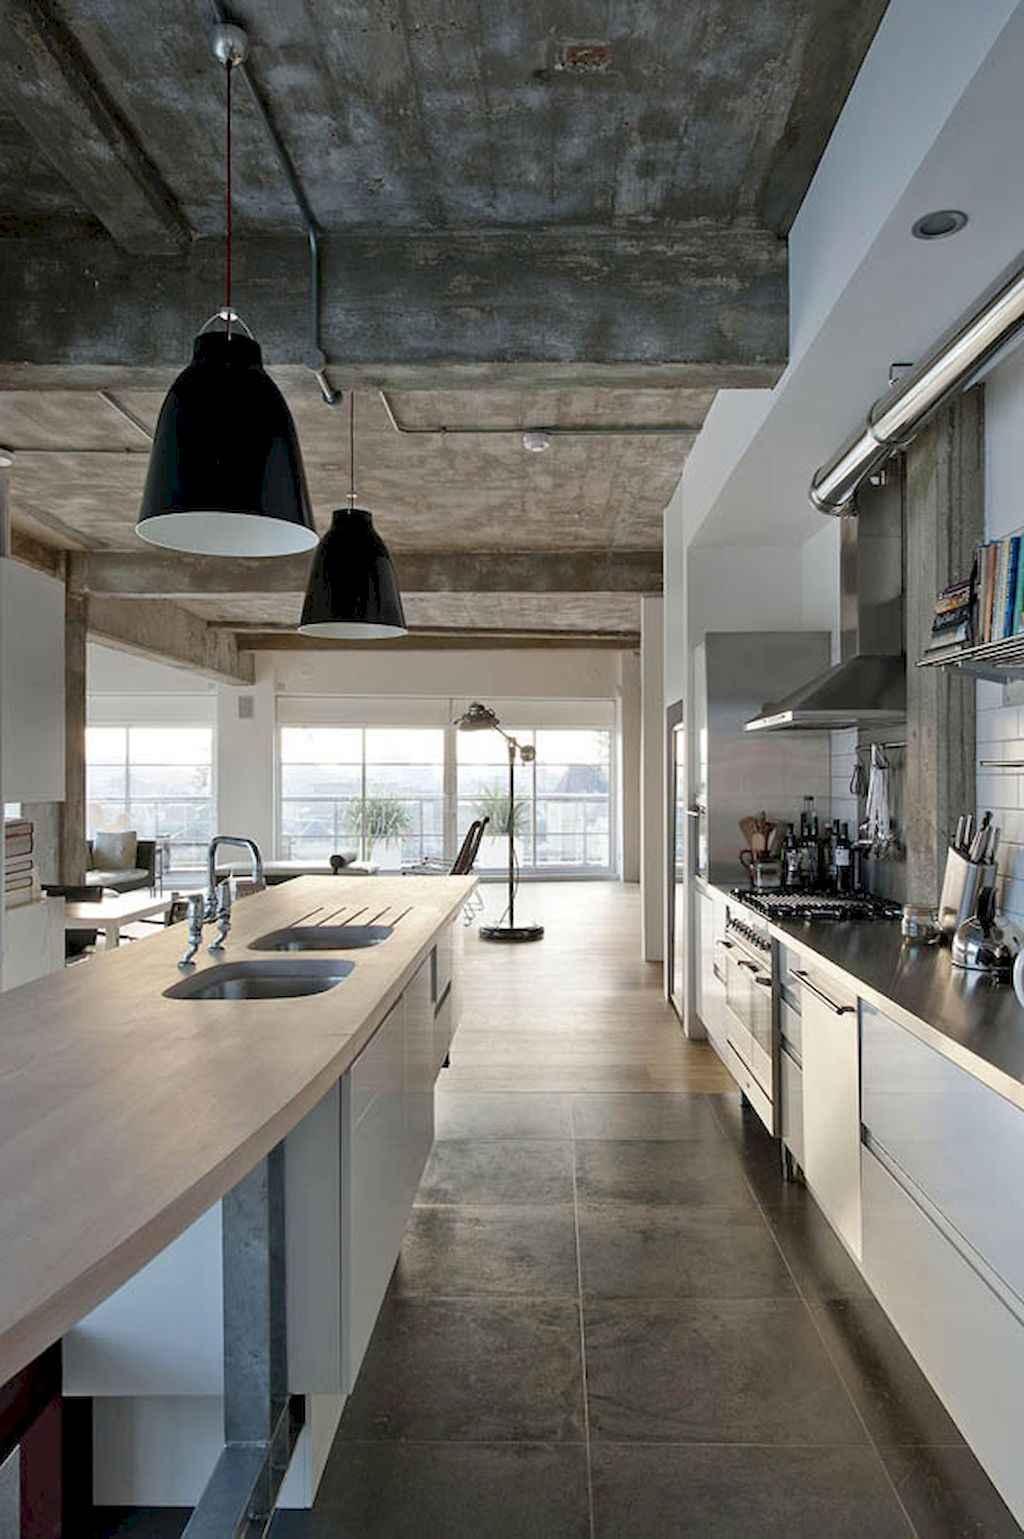 Cool creative loft apartment decorating ideas (51)